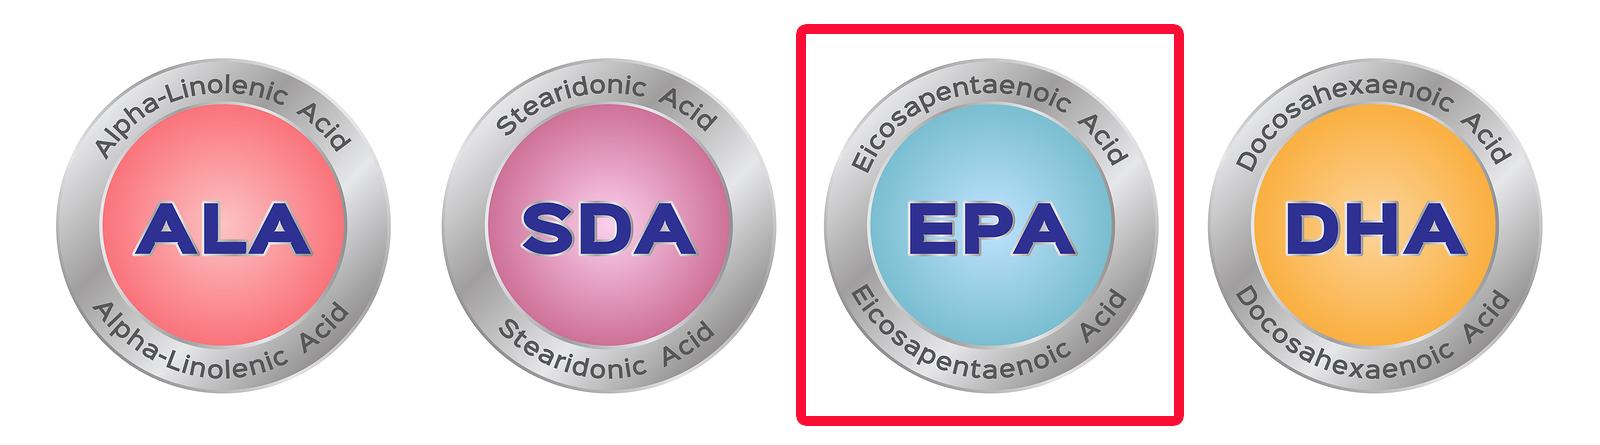 Eicosapentaenoic acid healthmatters.io epa high low meaning genova health